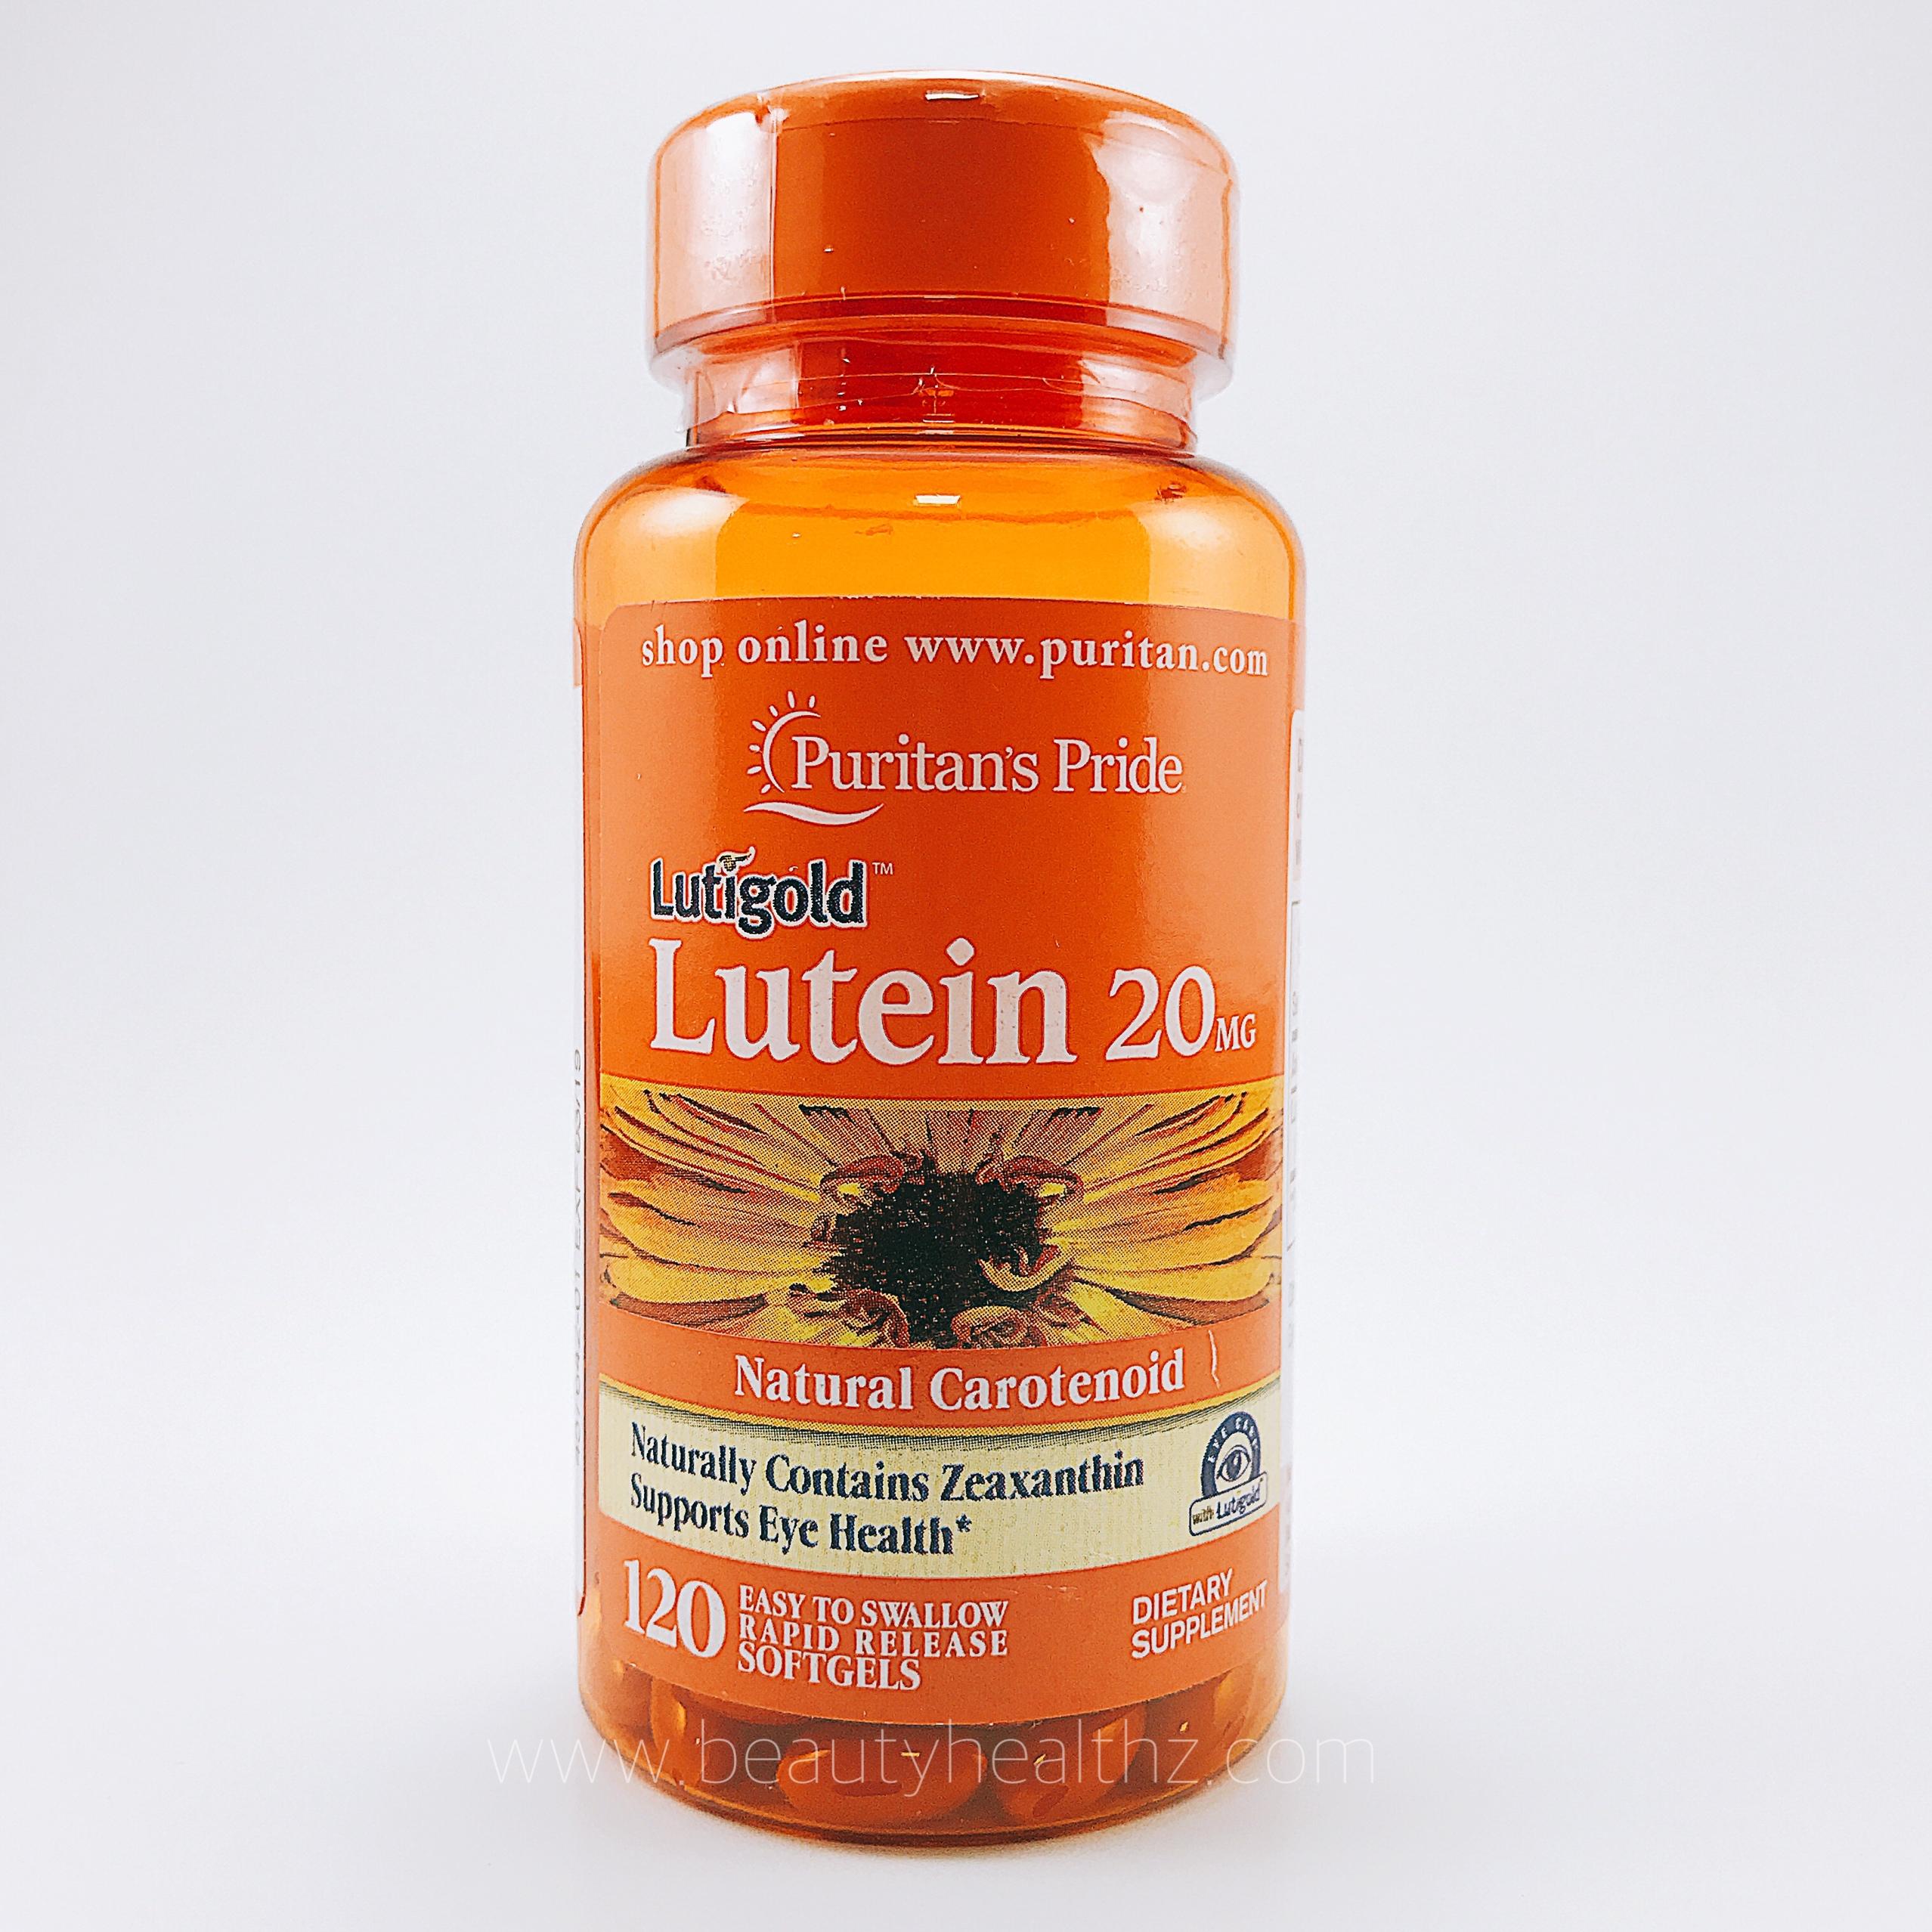 Puritan's Pride, Lutein 20 mg with Zeaxanthin, 120 Softgels